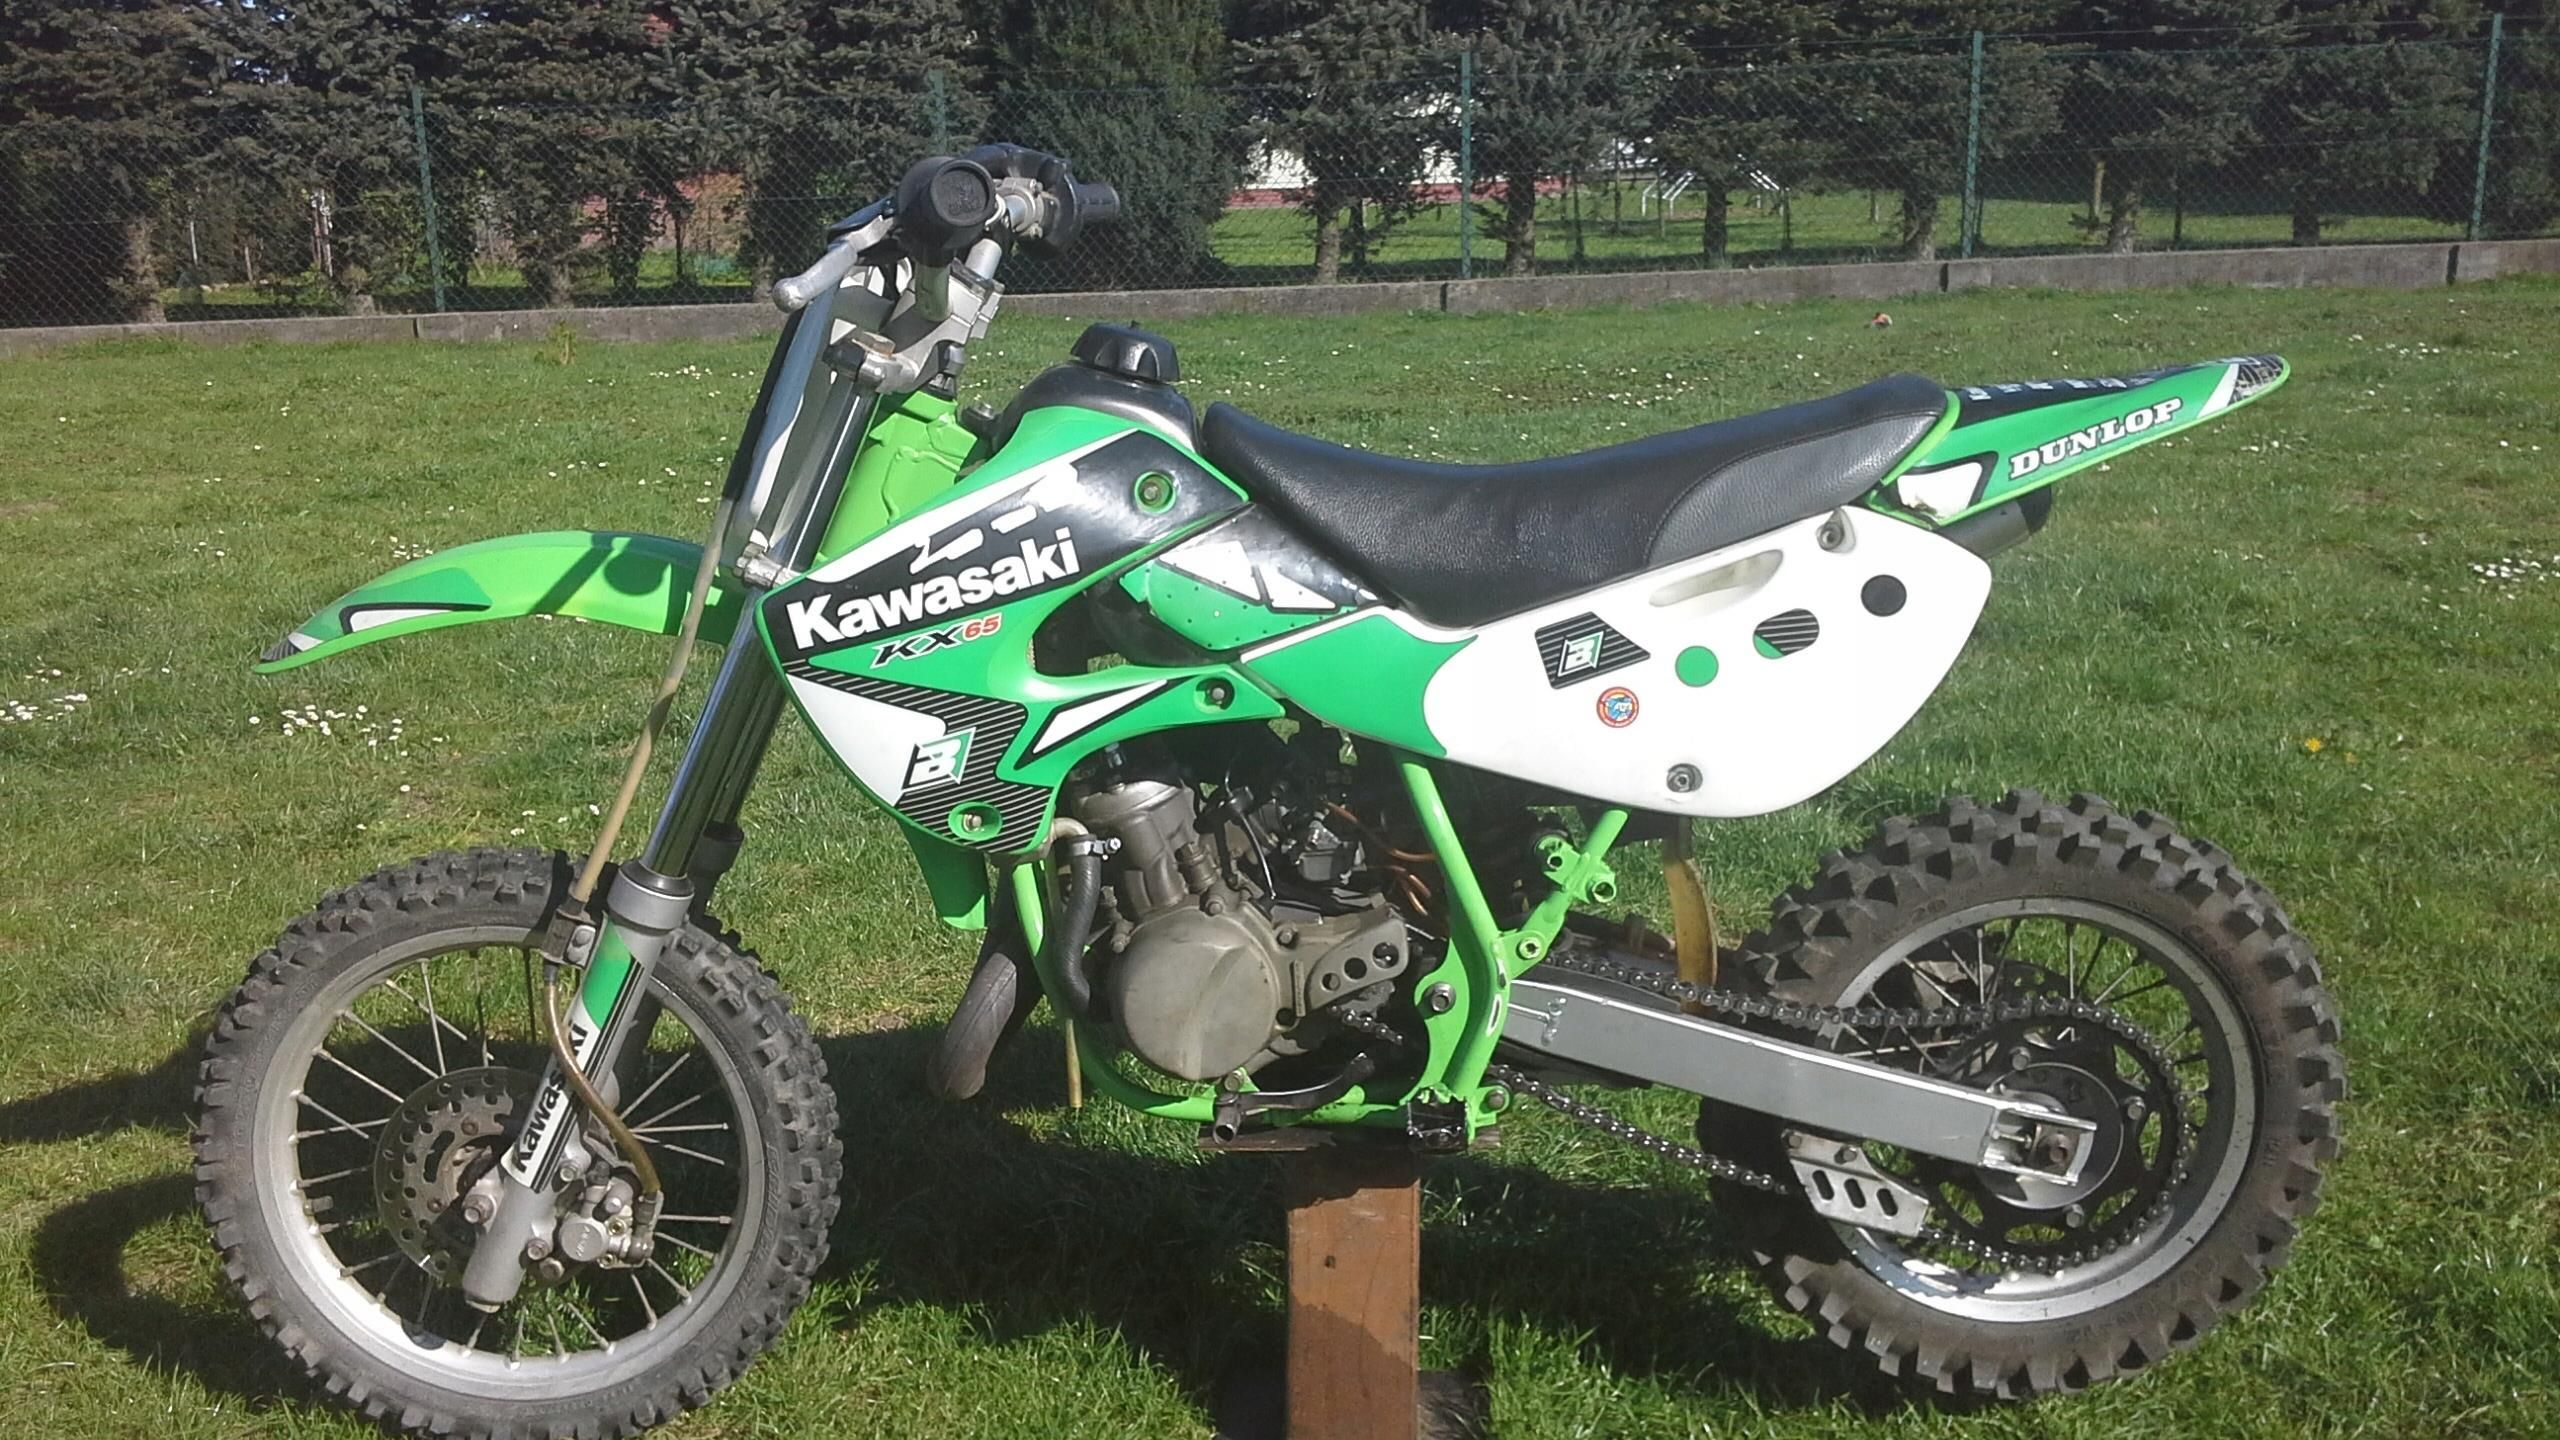 Cross Kawasaki Kx 65 Opinie I Ceny Na Ceneo Pl